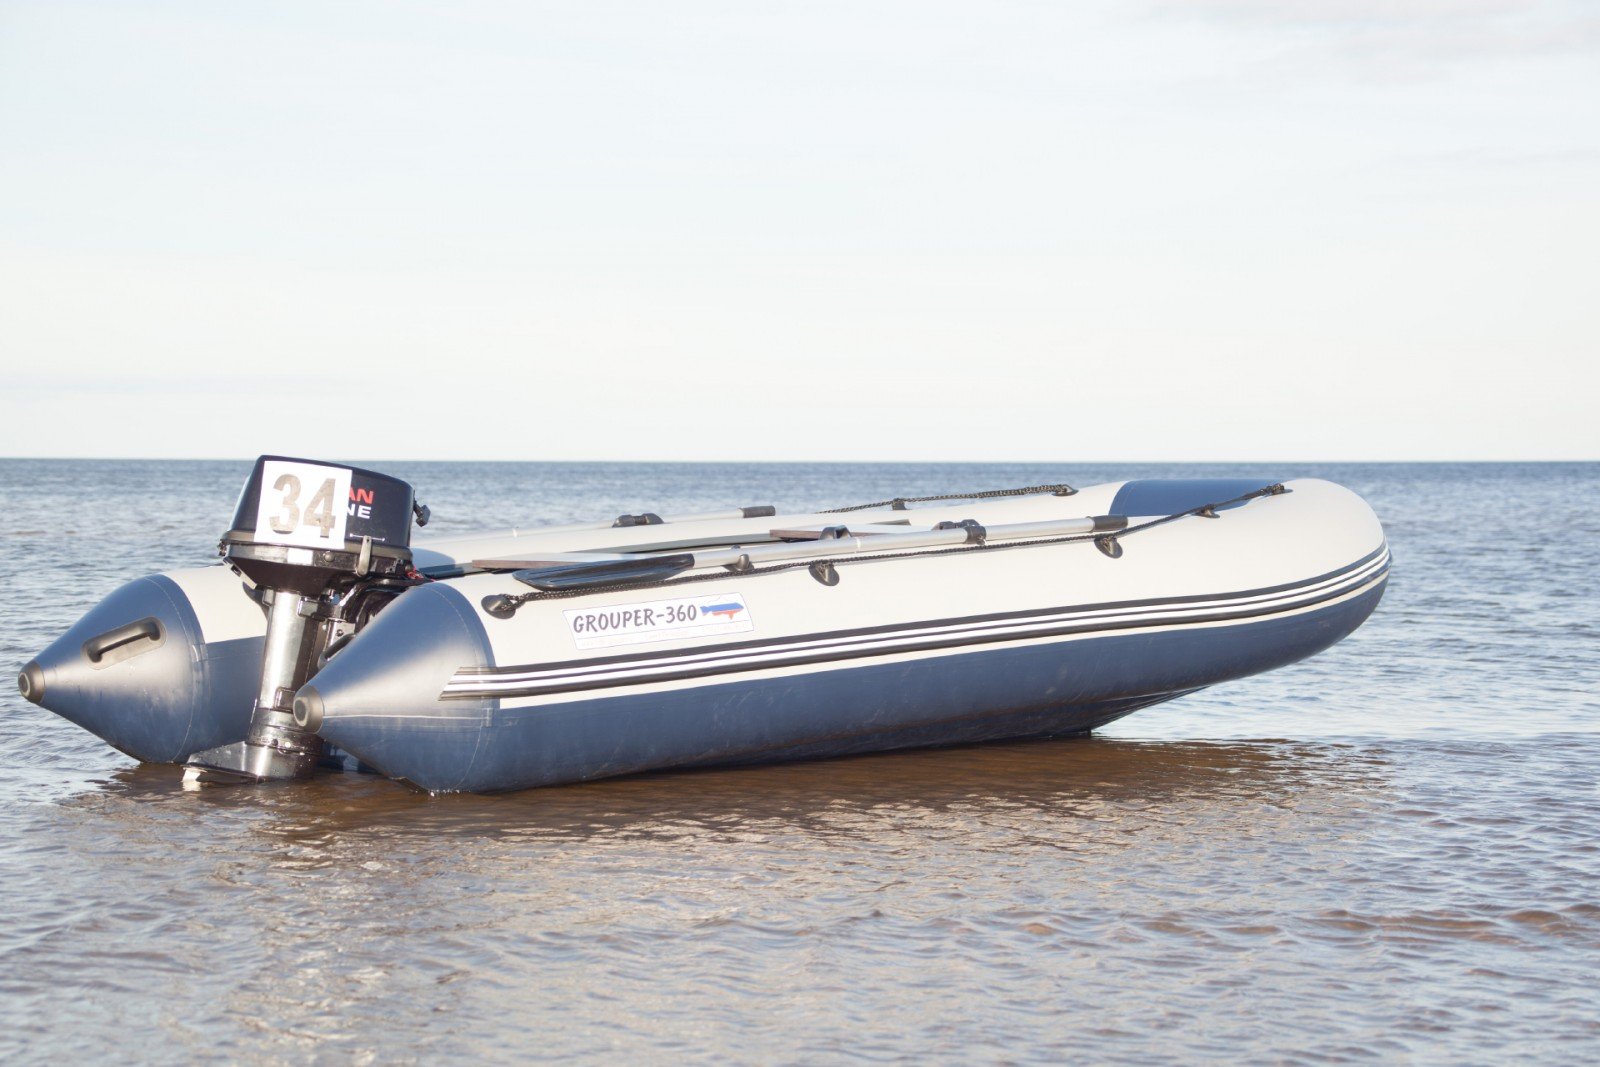 лодки пвх с нднд фрегат купить